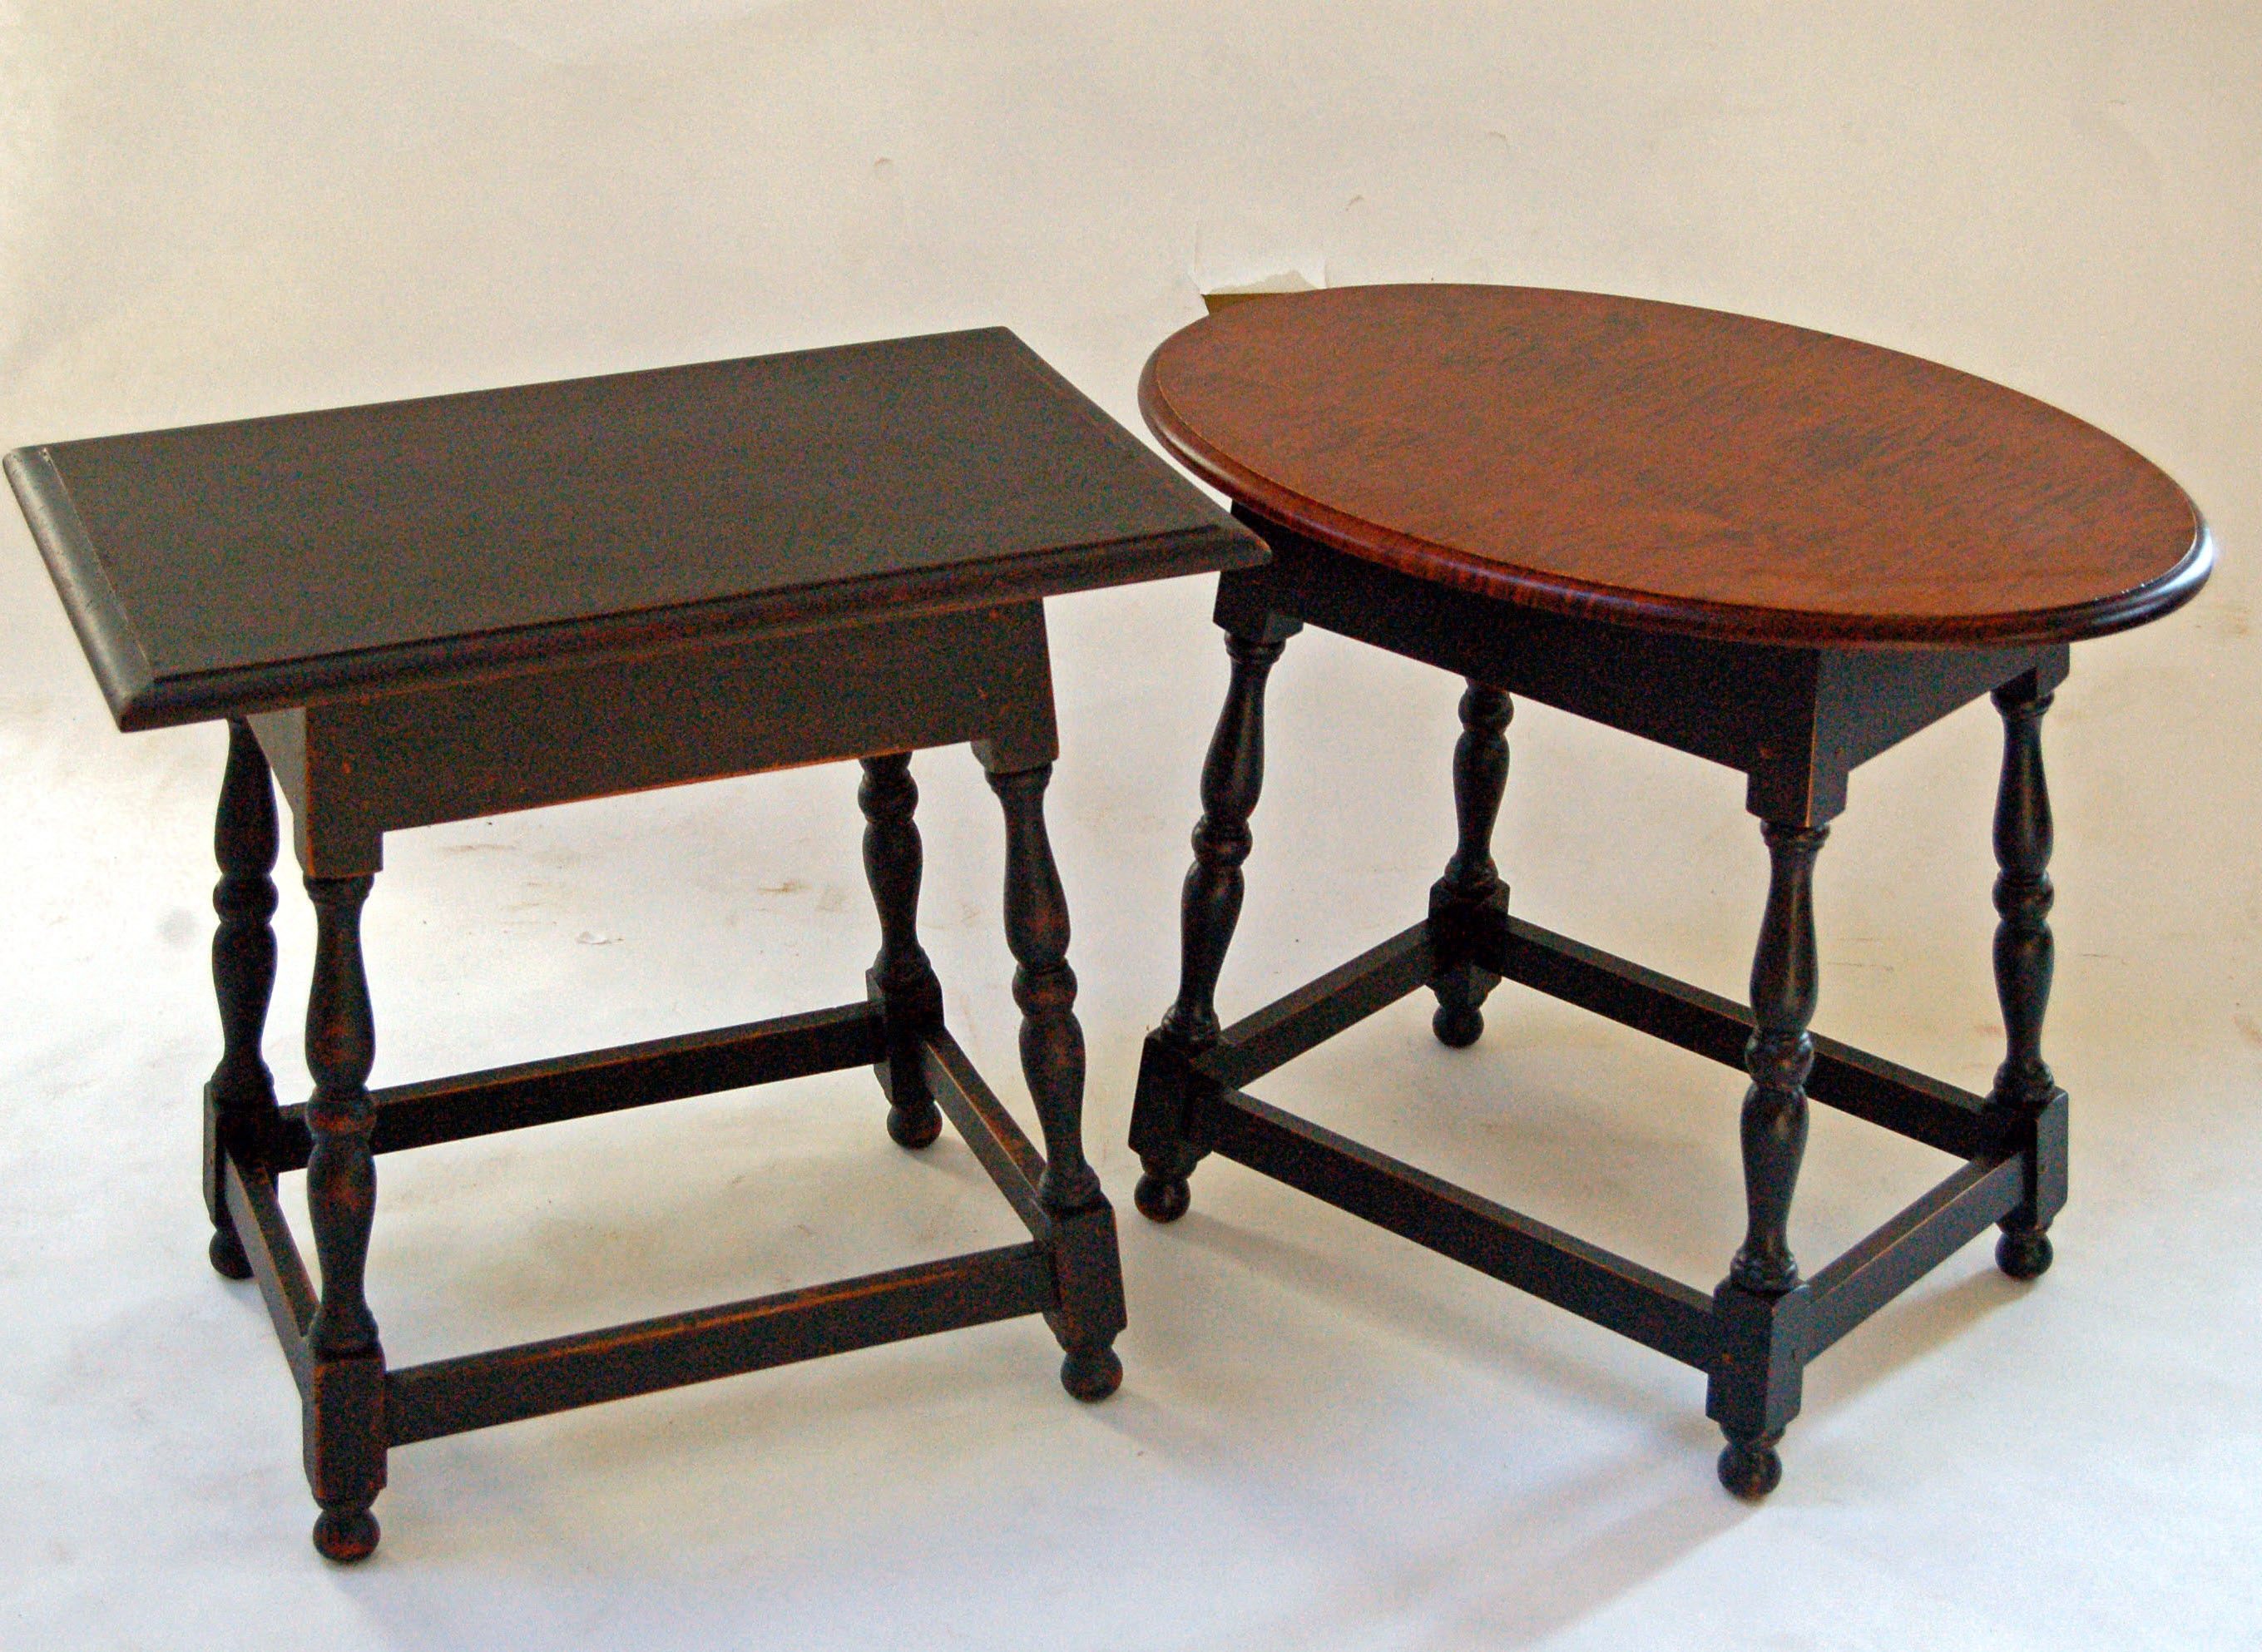 Kitchen round tables photo - 3